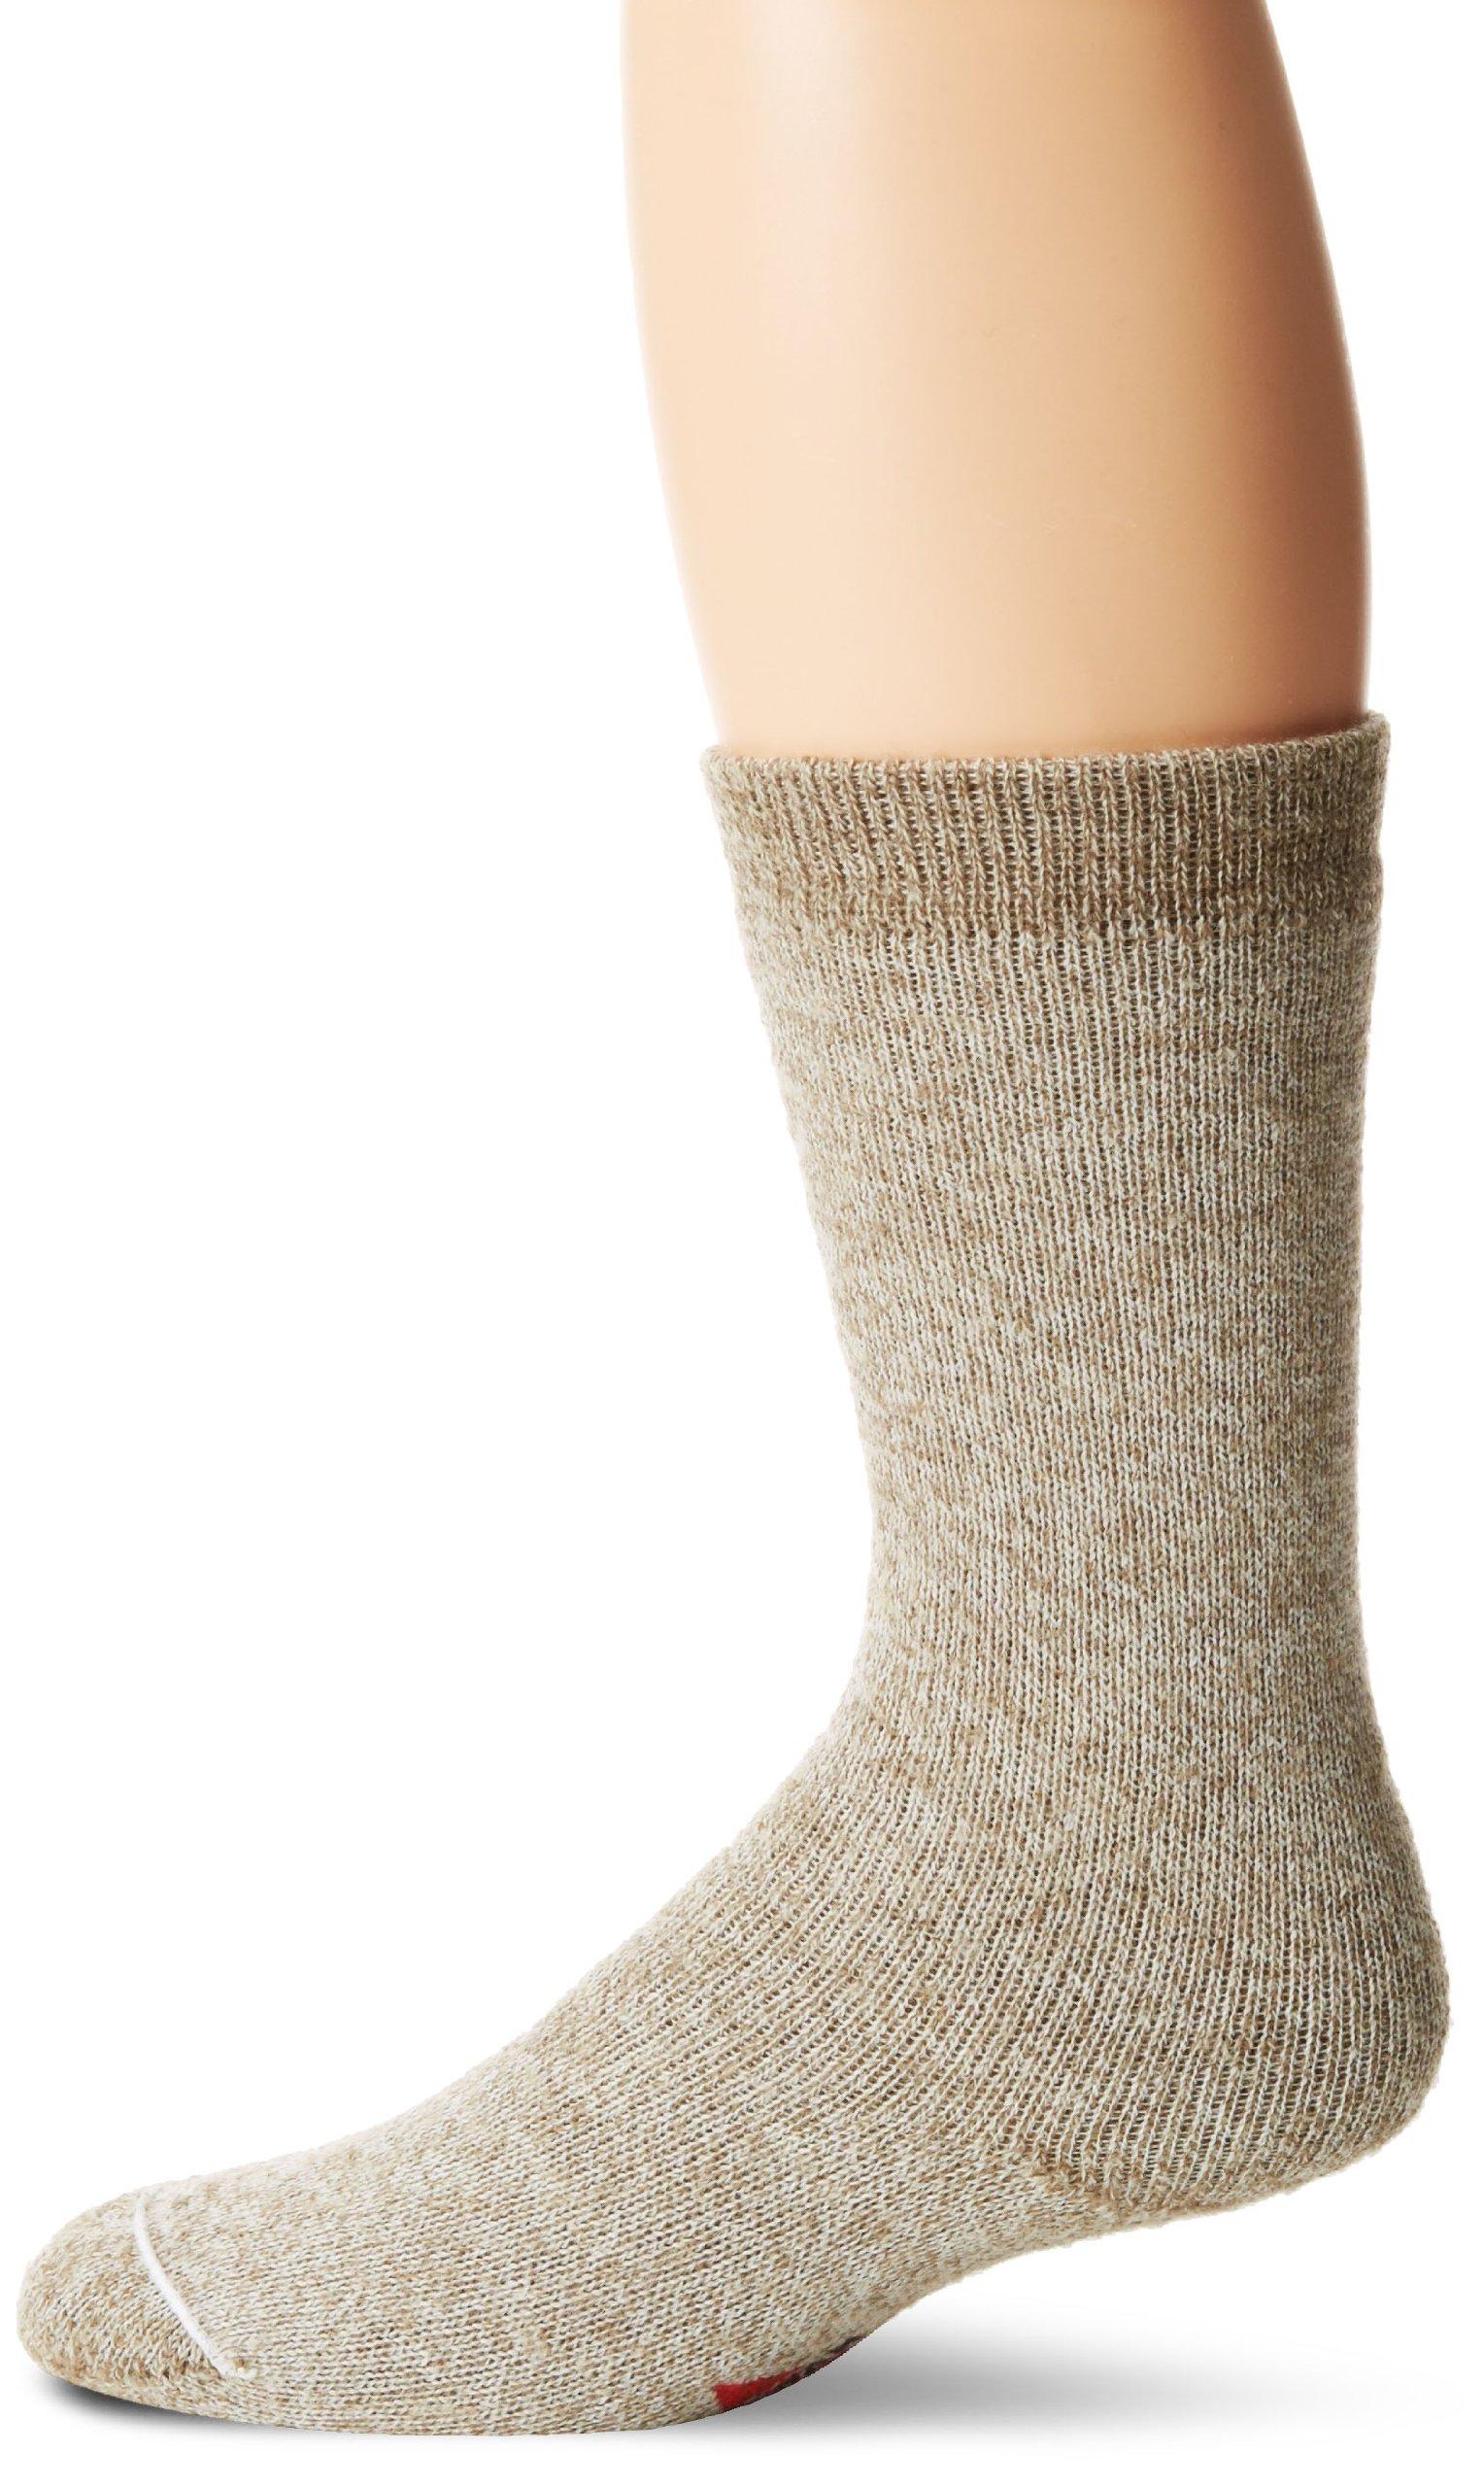 Wigwam Men's 40 Below Heavyweight Boot Socks, Grey Twist, Medium by Wigwam